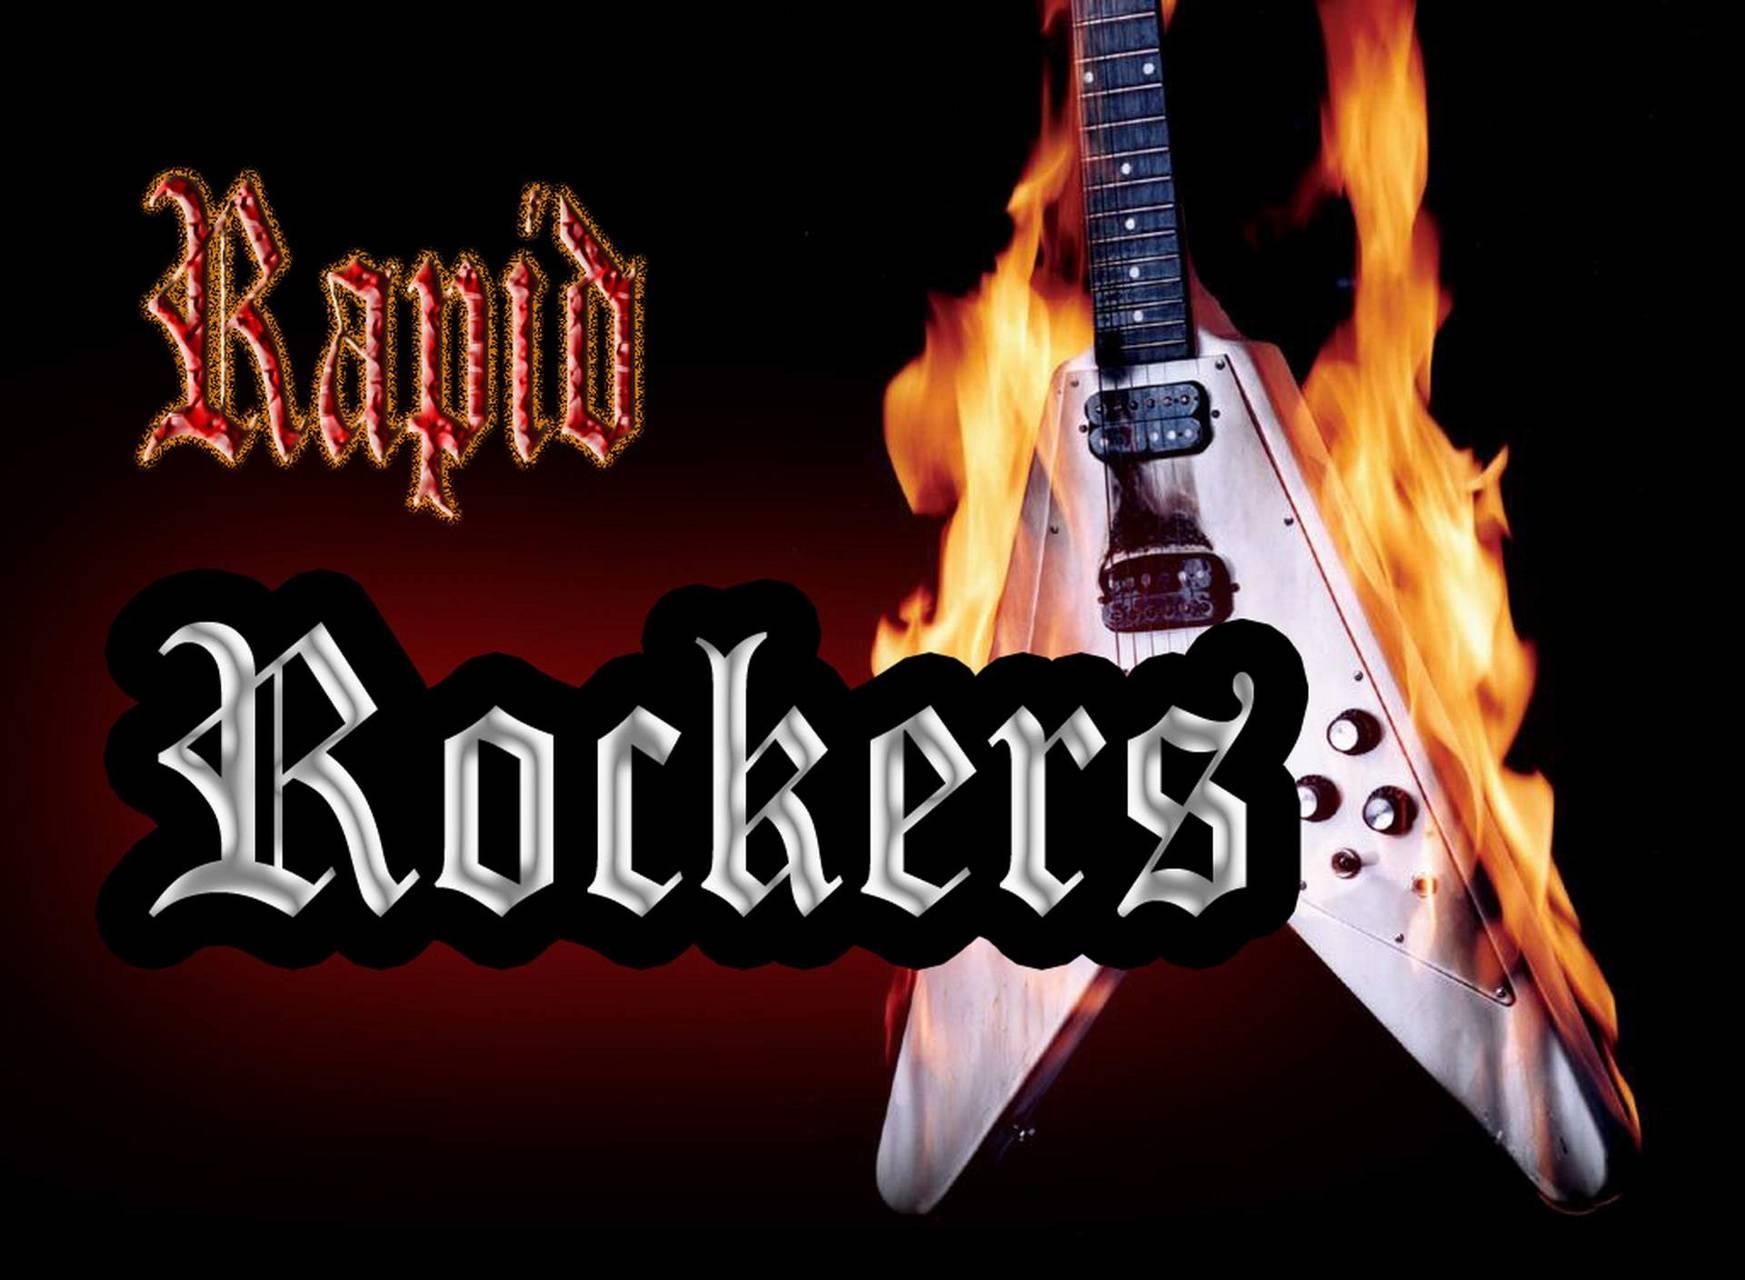 Rapid Rockers